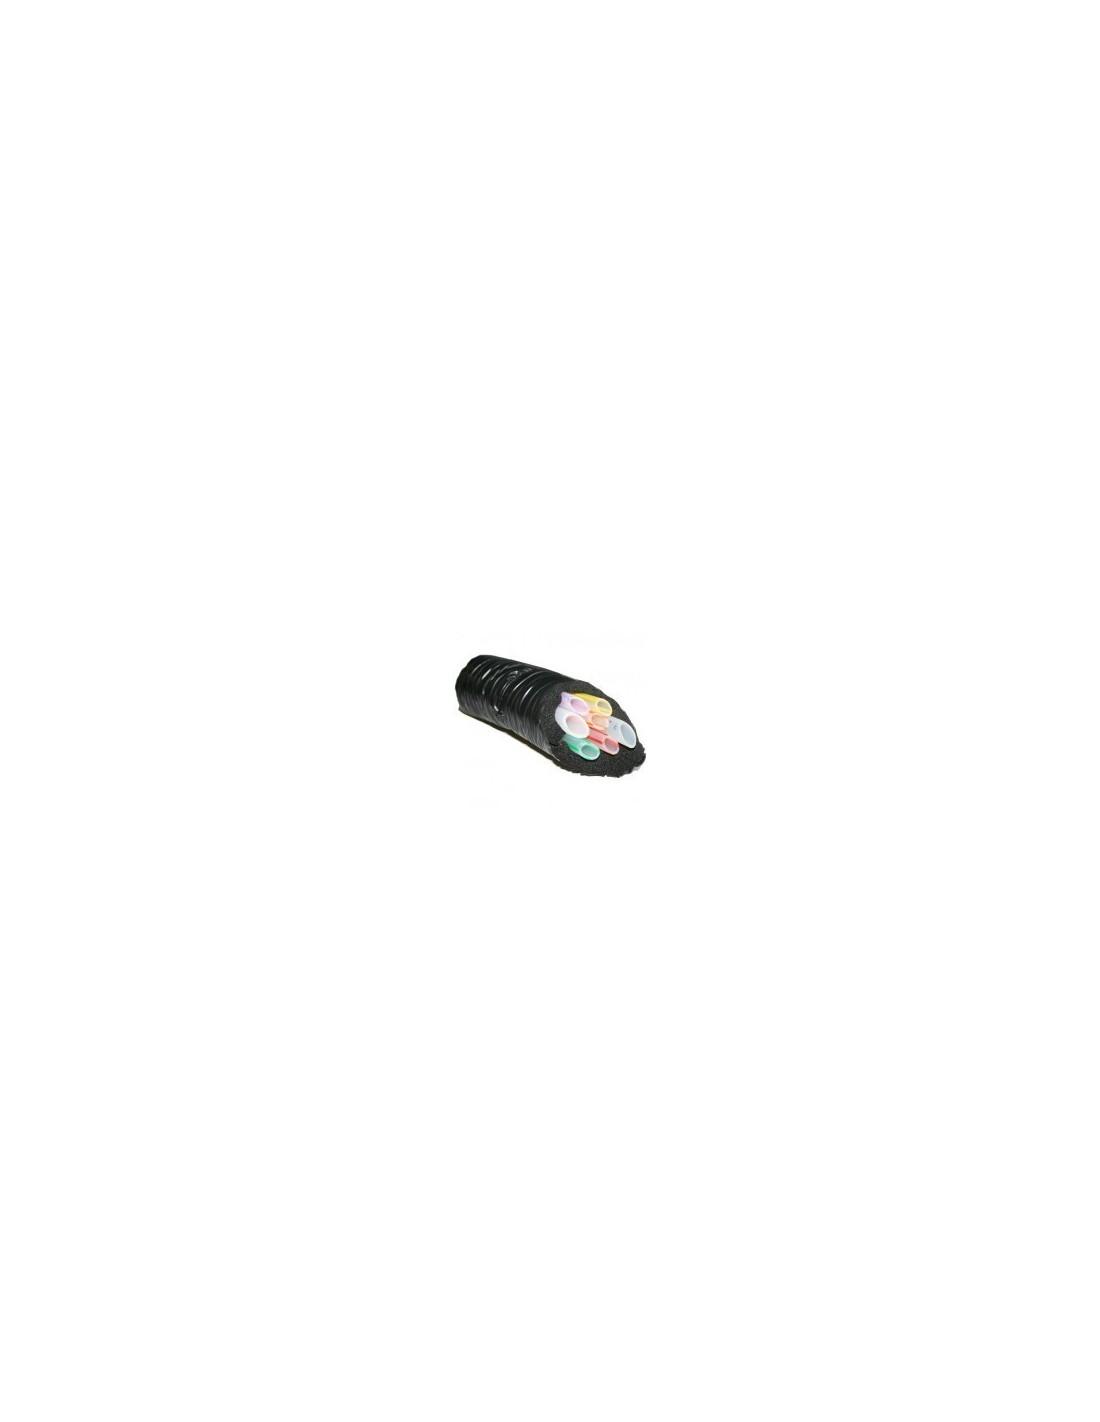 HAD00319 - Python 5 + 2